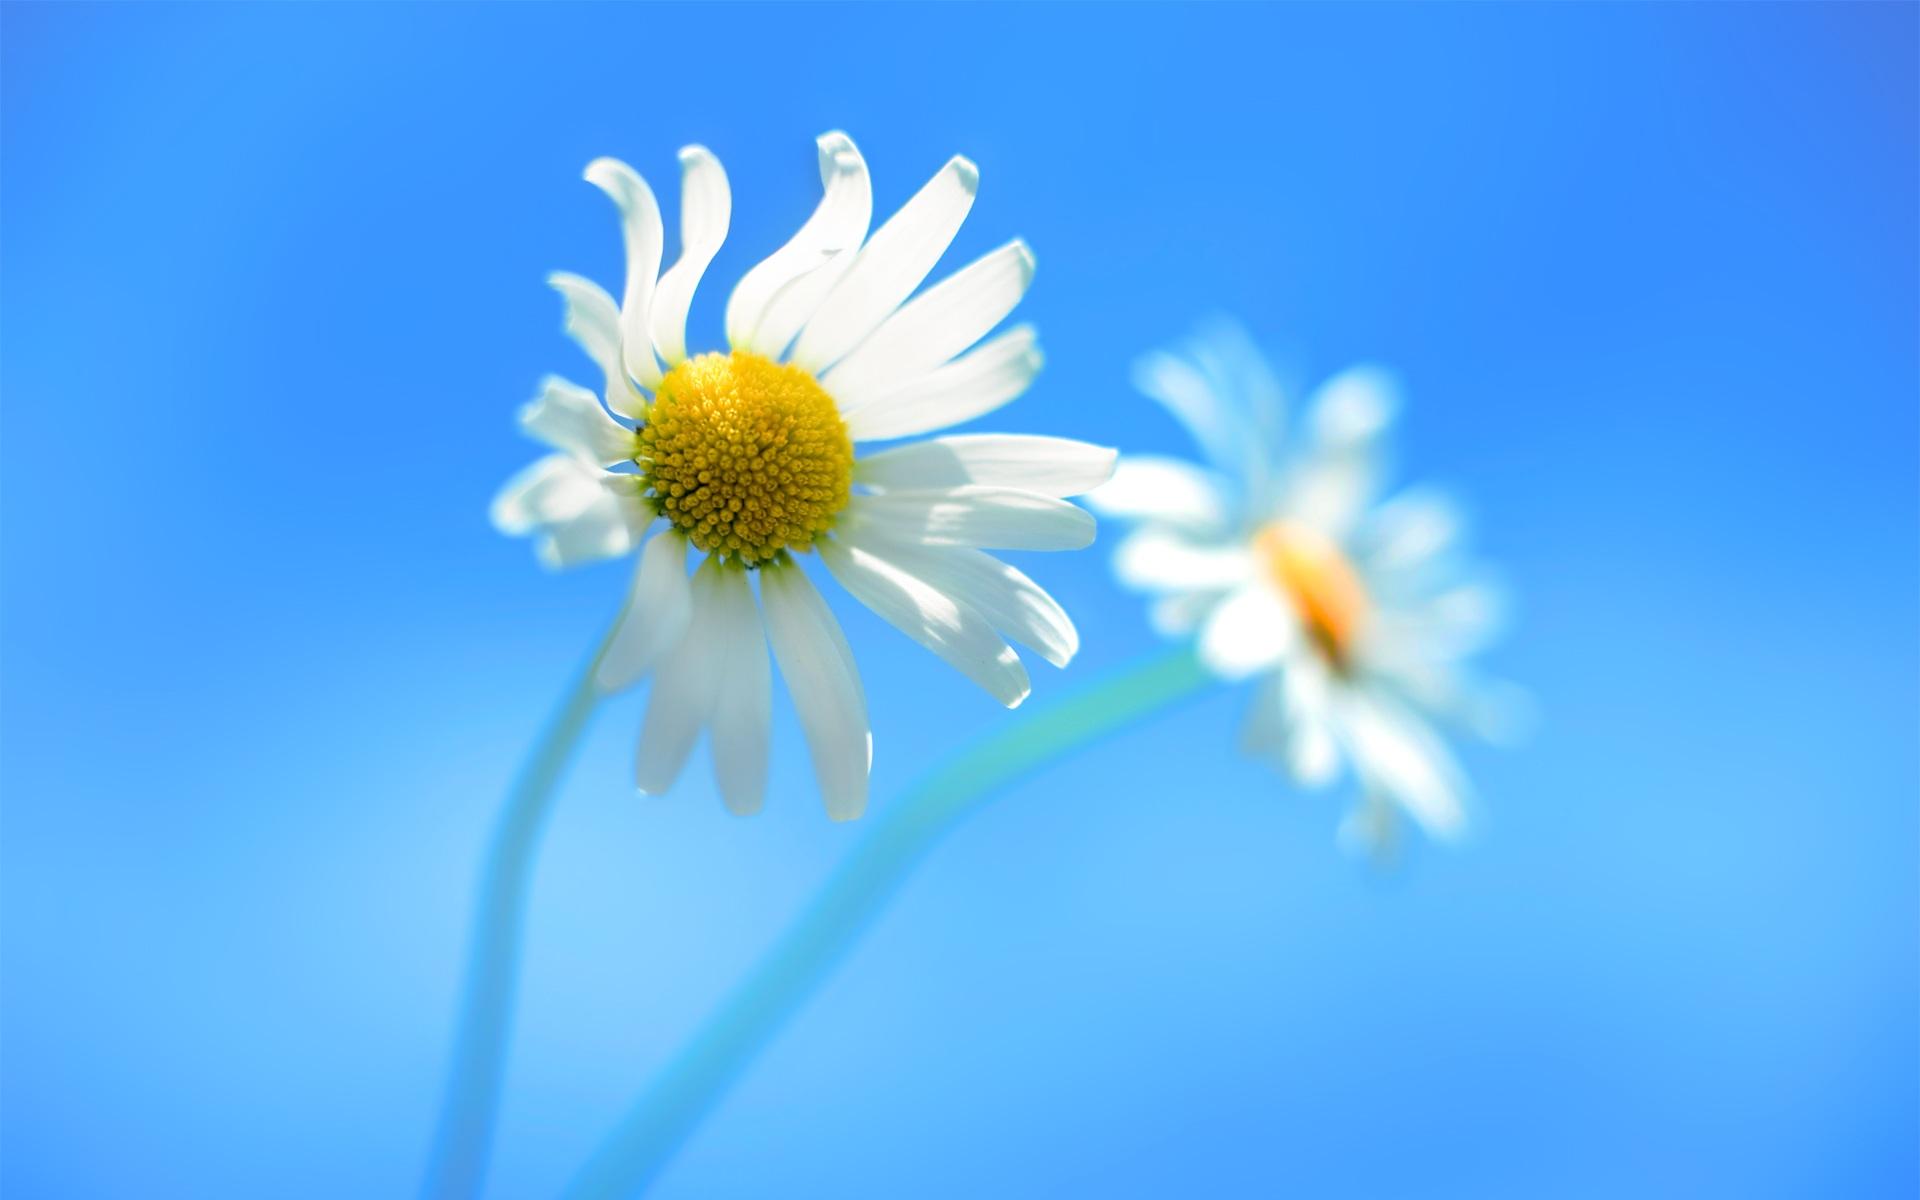 Gambar Mekar Menanam Padang Rumput Sinar Matahari Daun Bunga